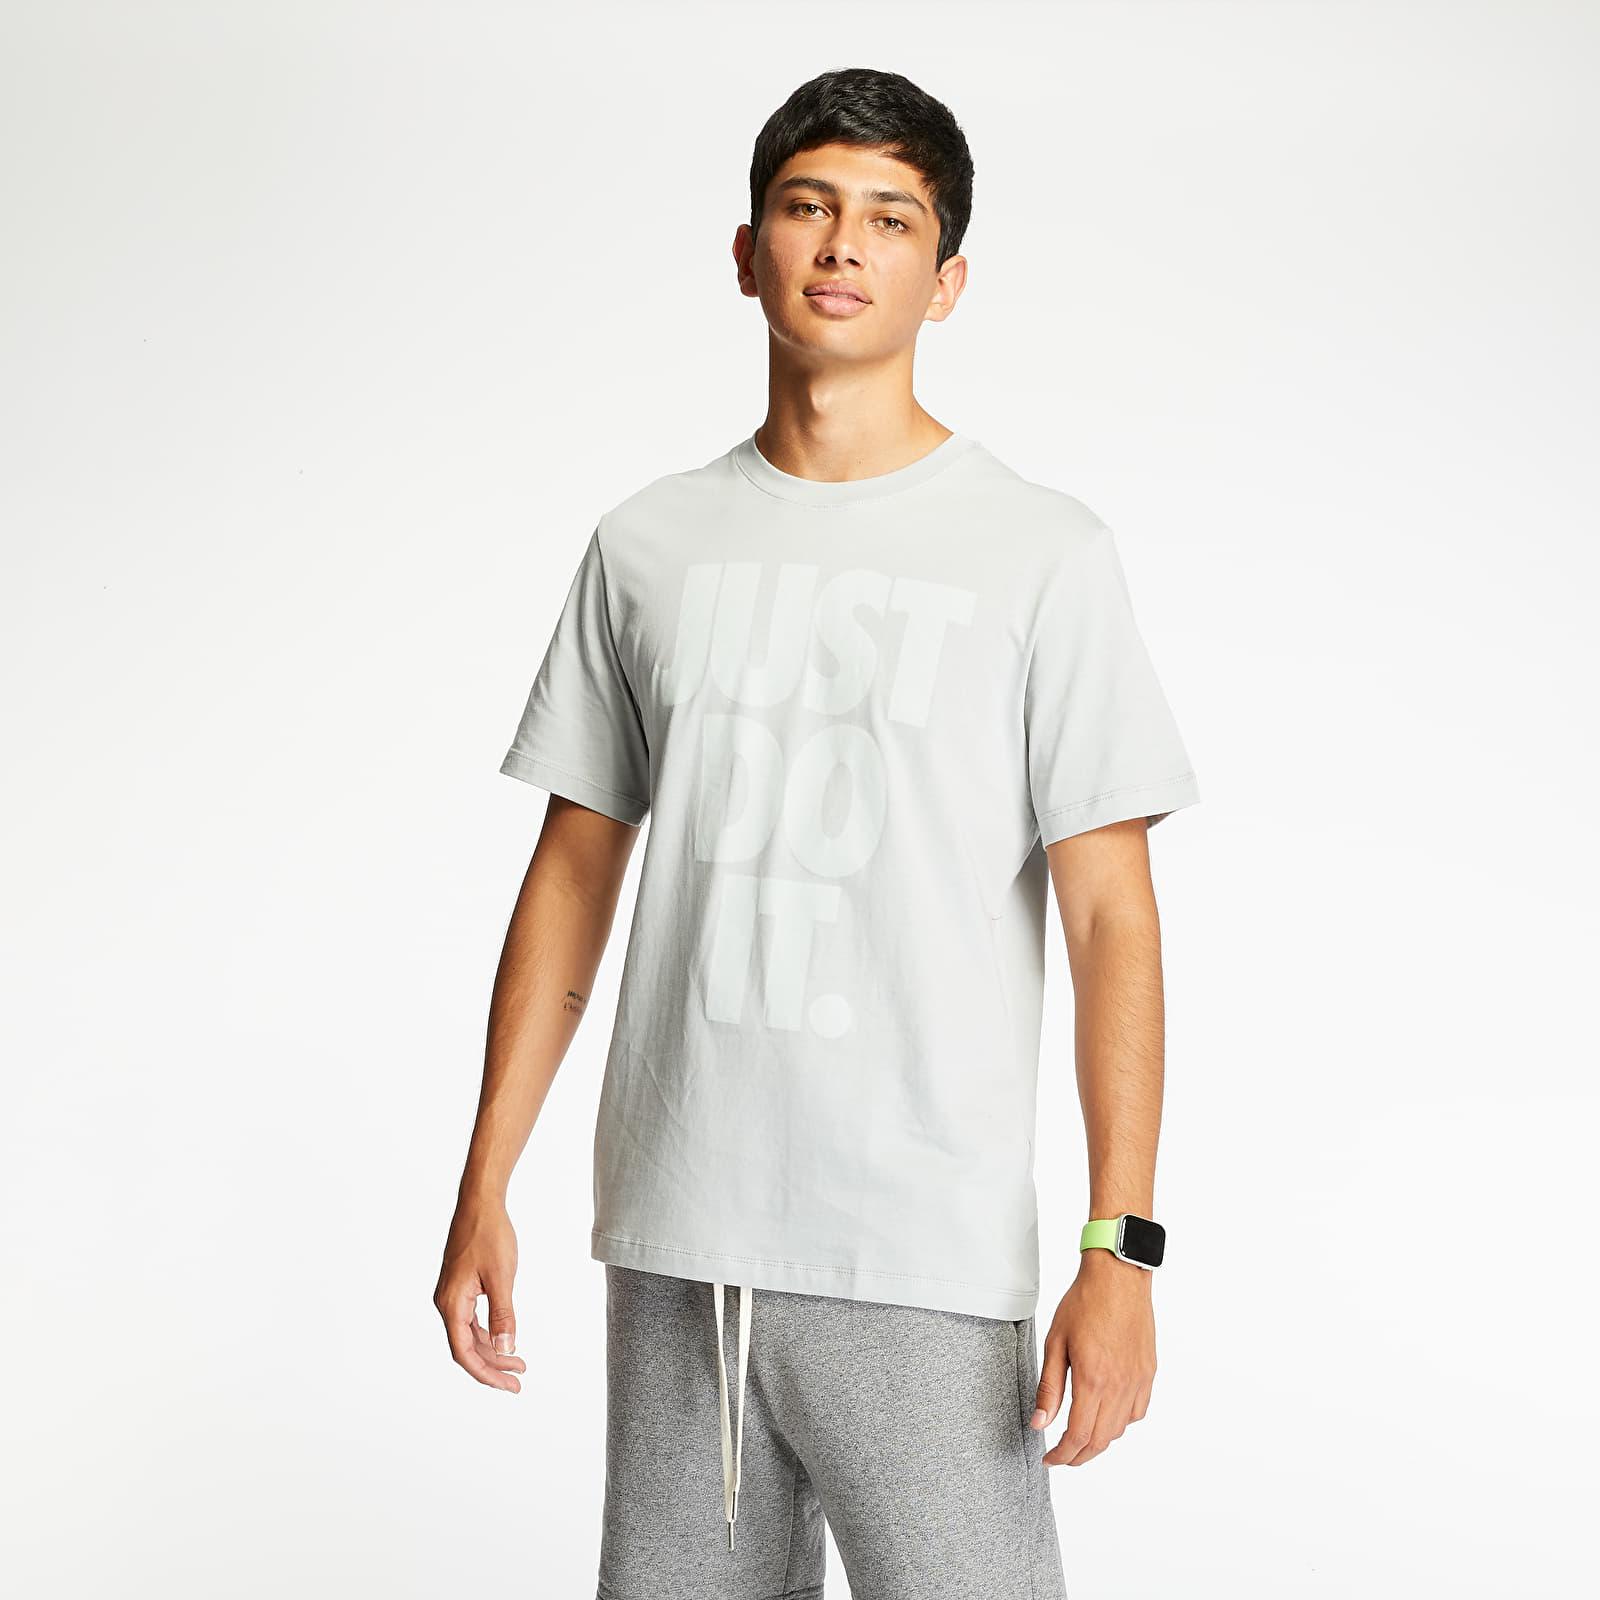 Nike Sportswear Just Do It Wash Tee Lt Smoke Grey/ White, Gray